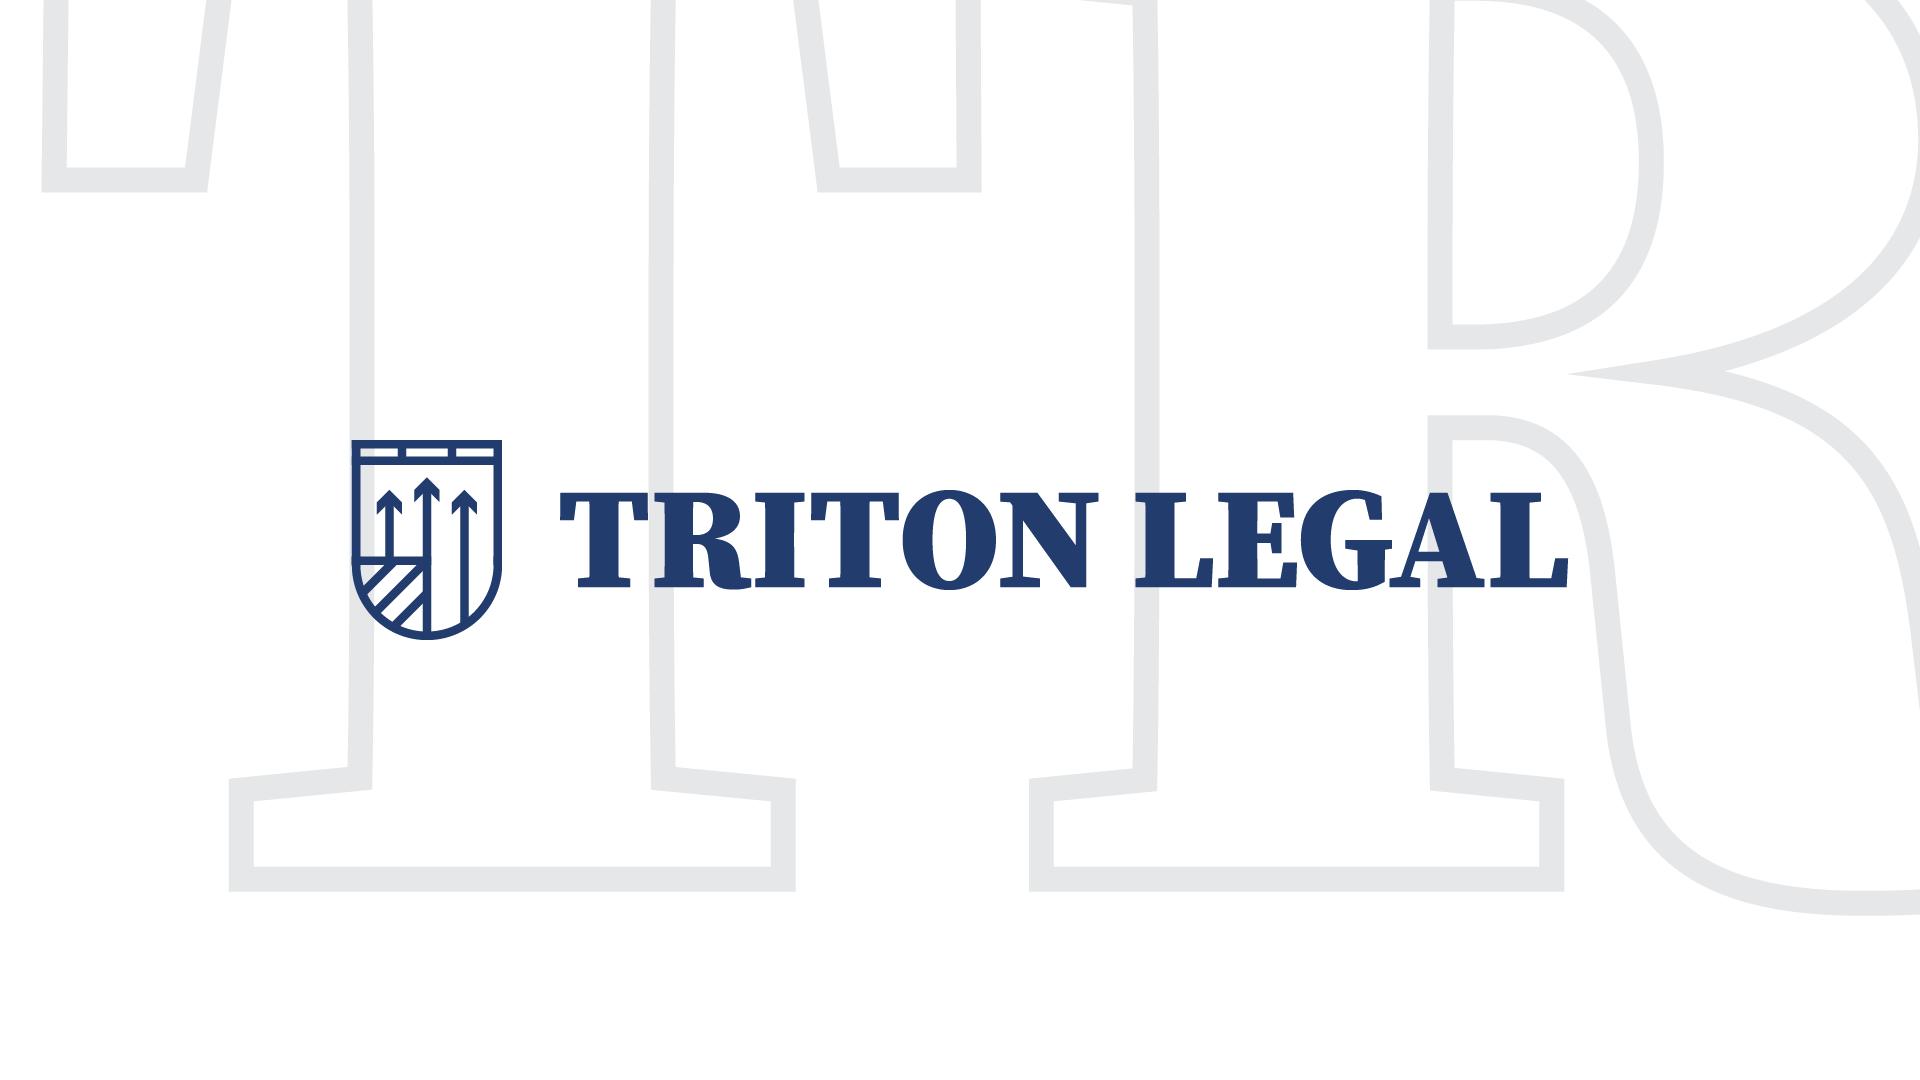 Triton Legal Case Study Image